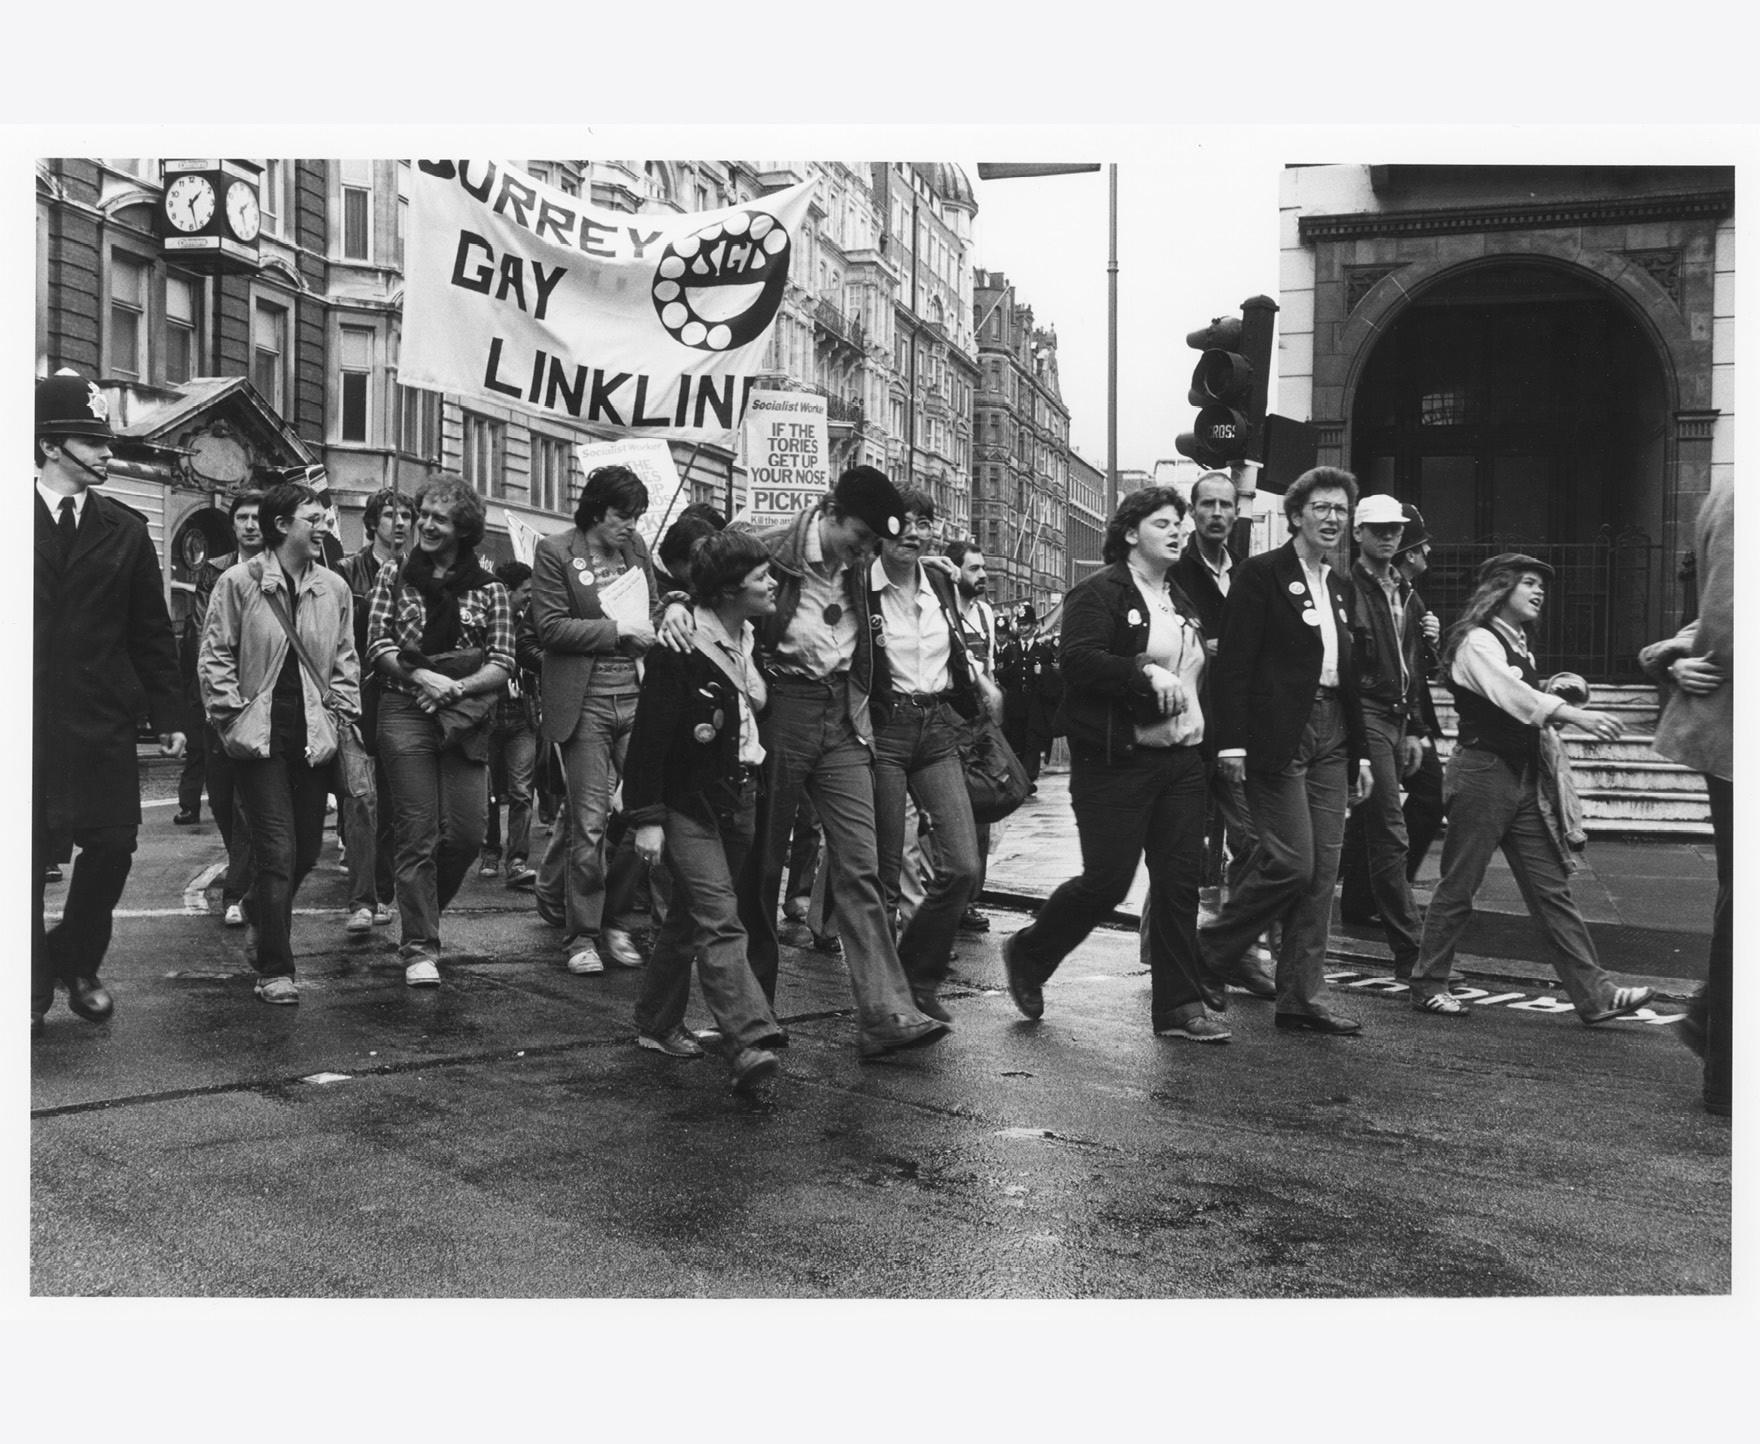 gay_pride_march_london_1980_2_7.jpg